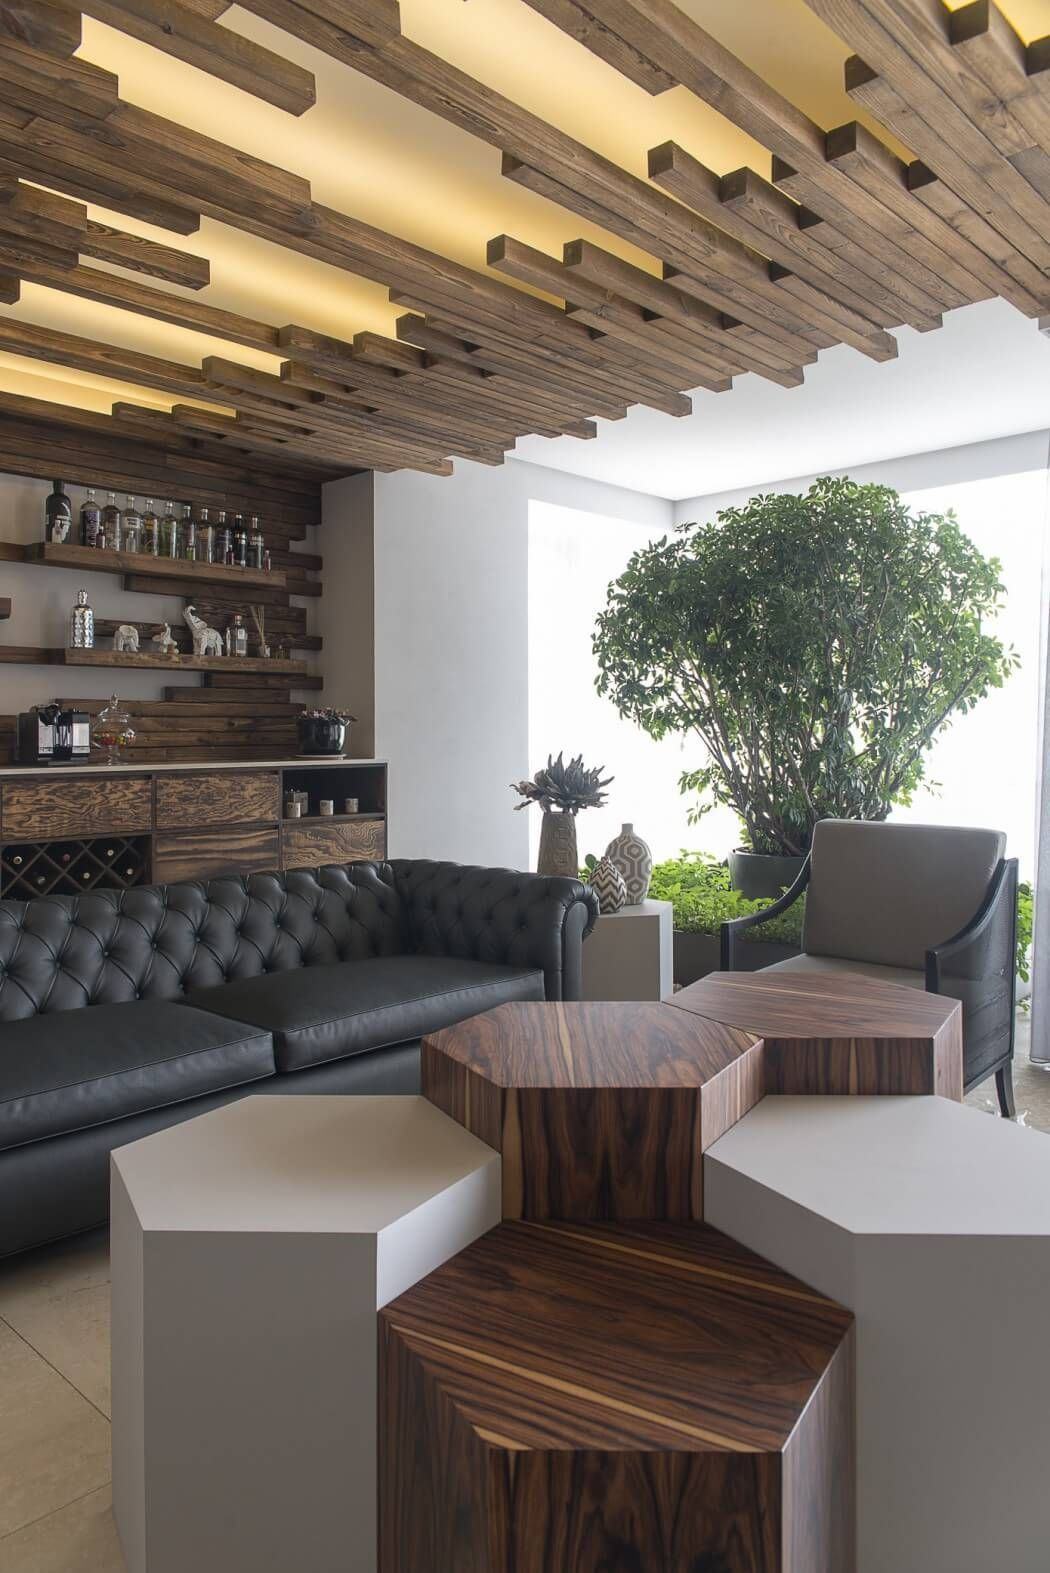 We Ve Seen Our Fair Allocation Of Creative Ceiling Design Ideas